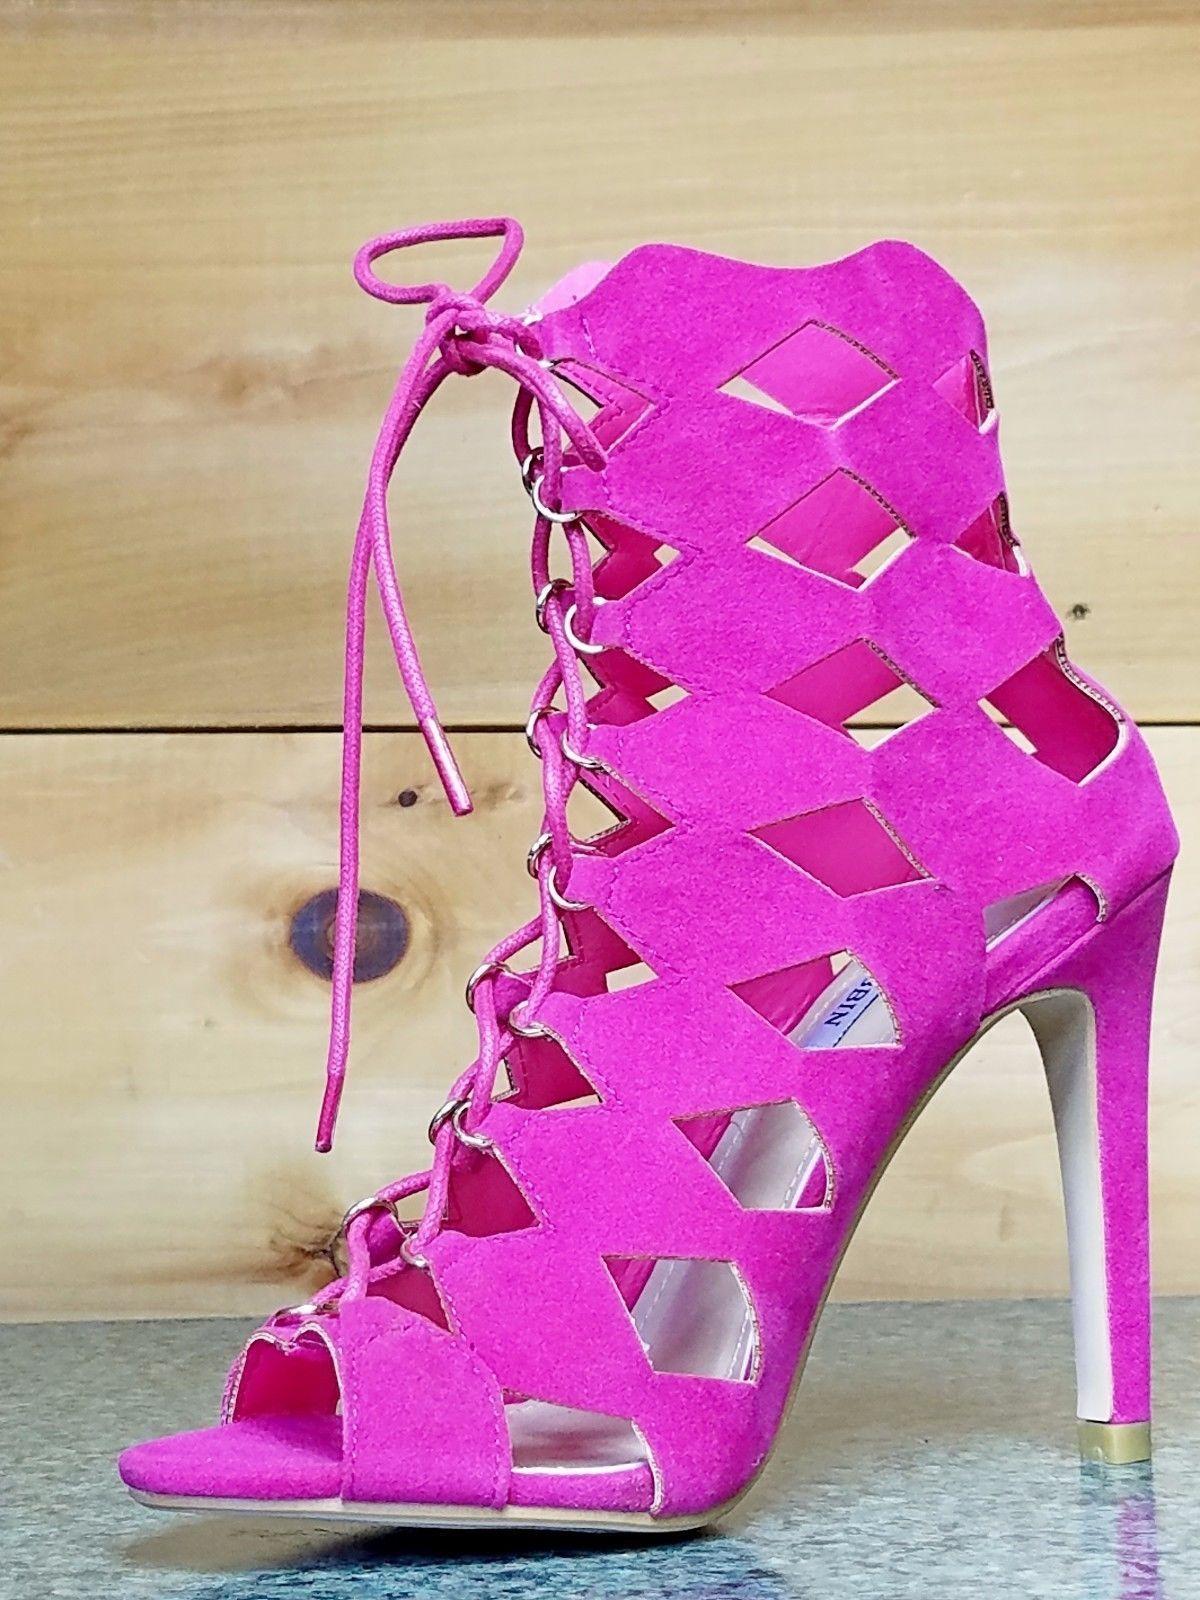 49cc6317162f Cape Robbin Heidi Fuchsia Diamond High Heel Cut-out Peep Toe Shoe ...